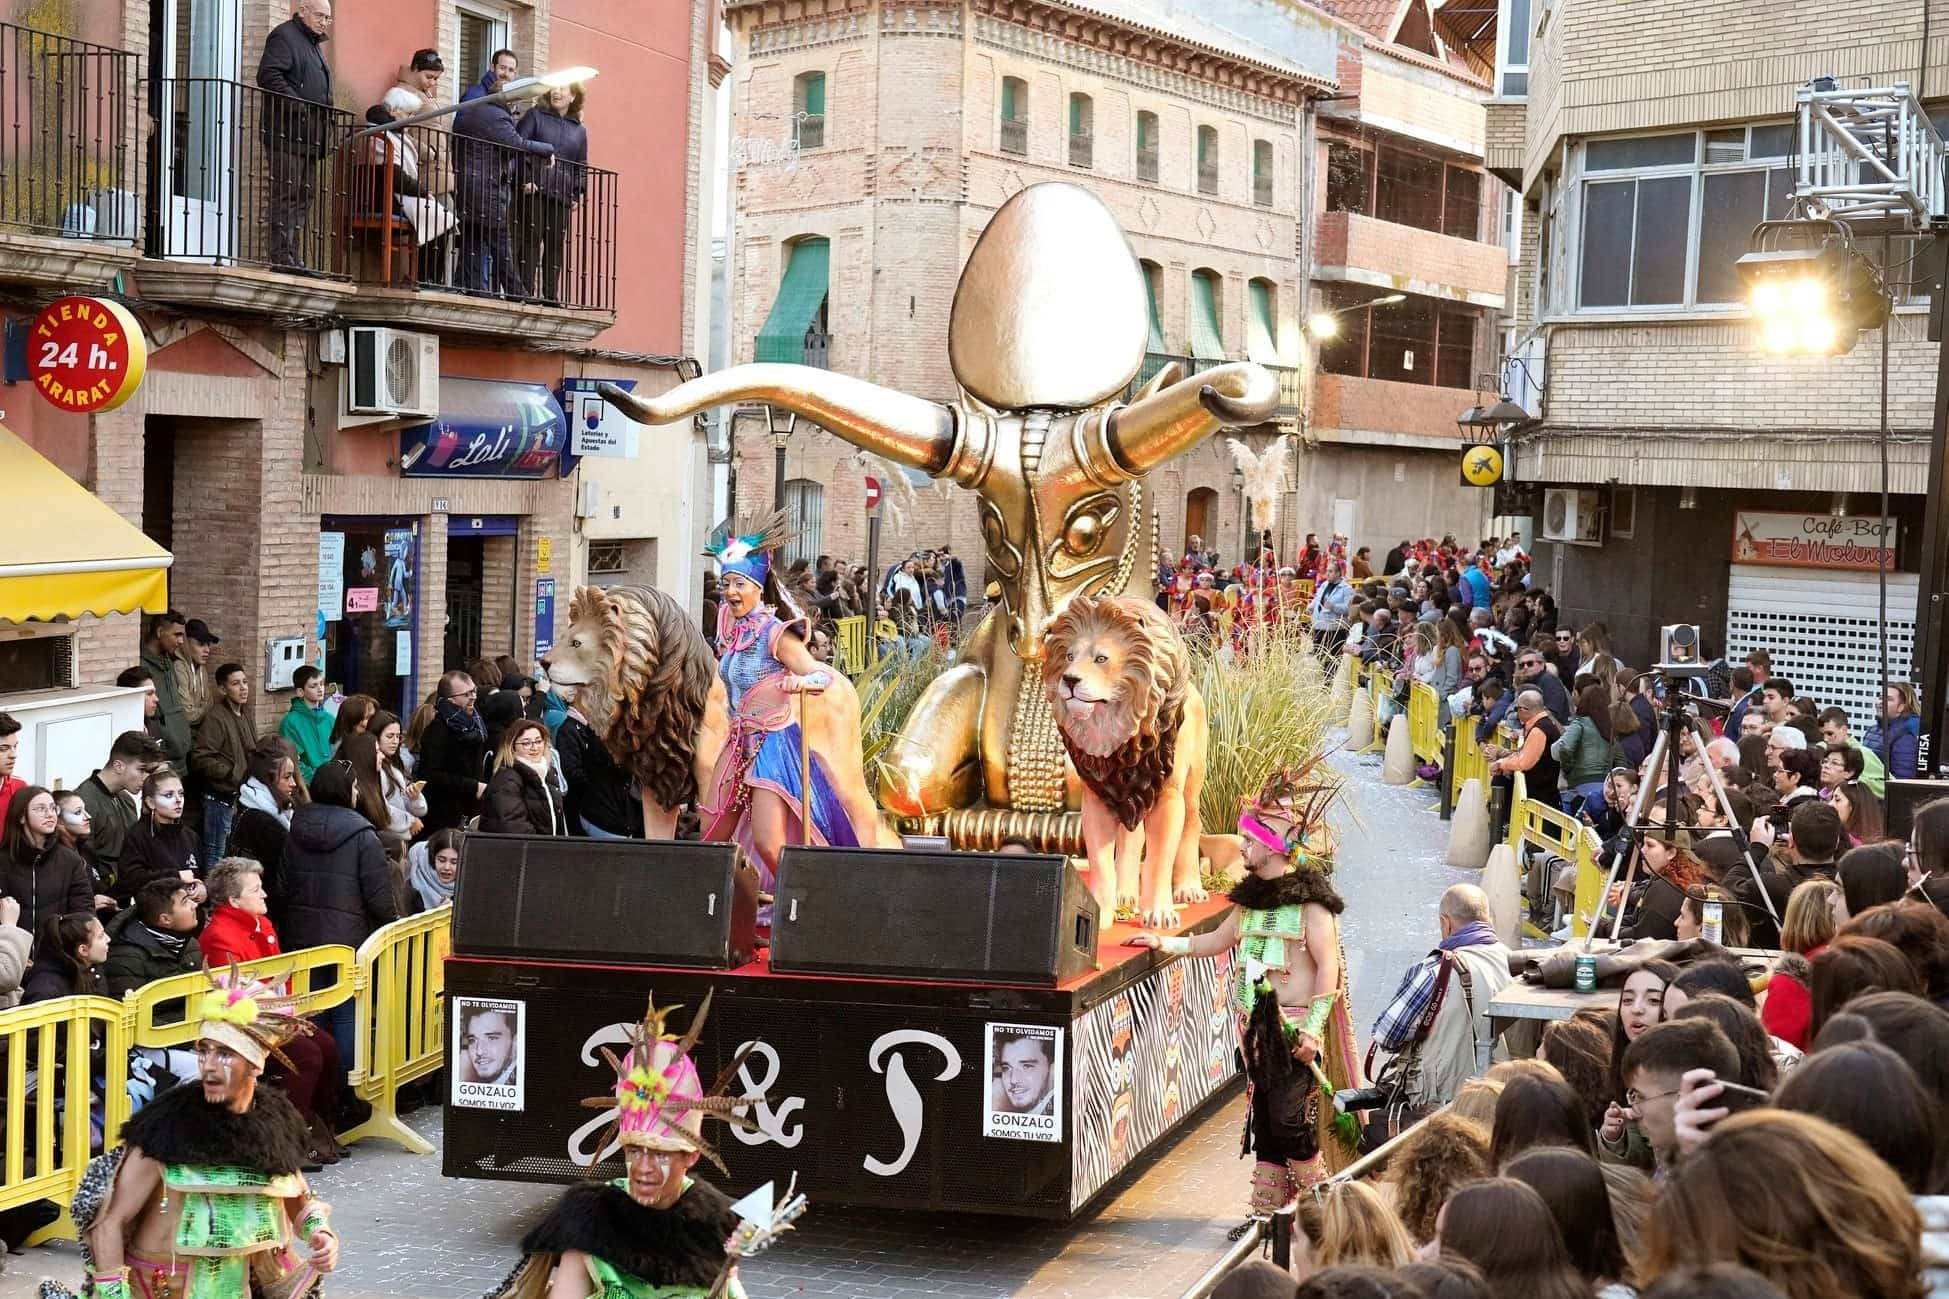 Carnaval de herencia 2020 ofertorio 90 - Selección de fotografías del Ofertorio del Carnaval de Herencia